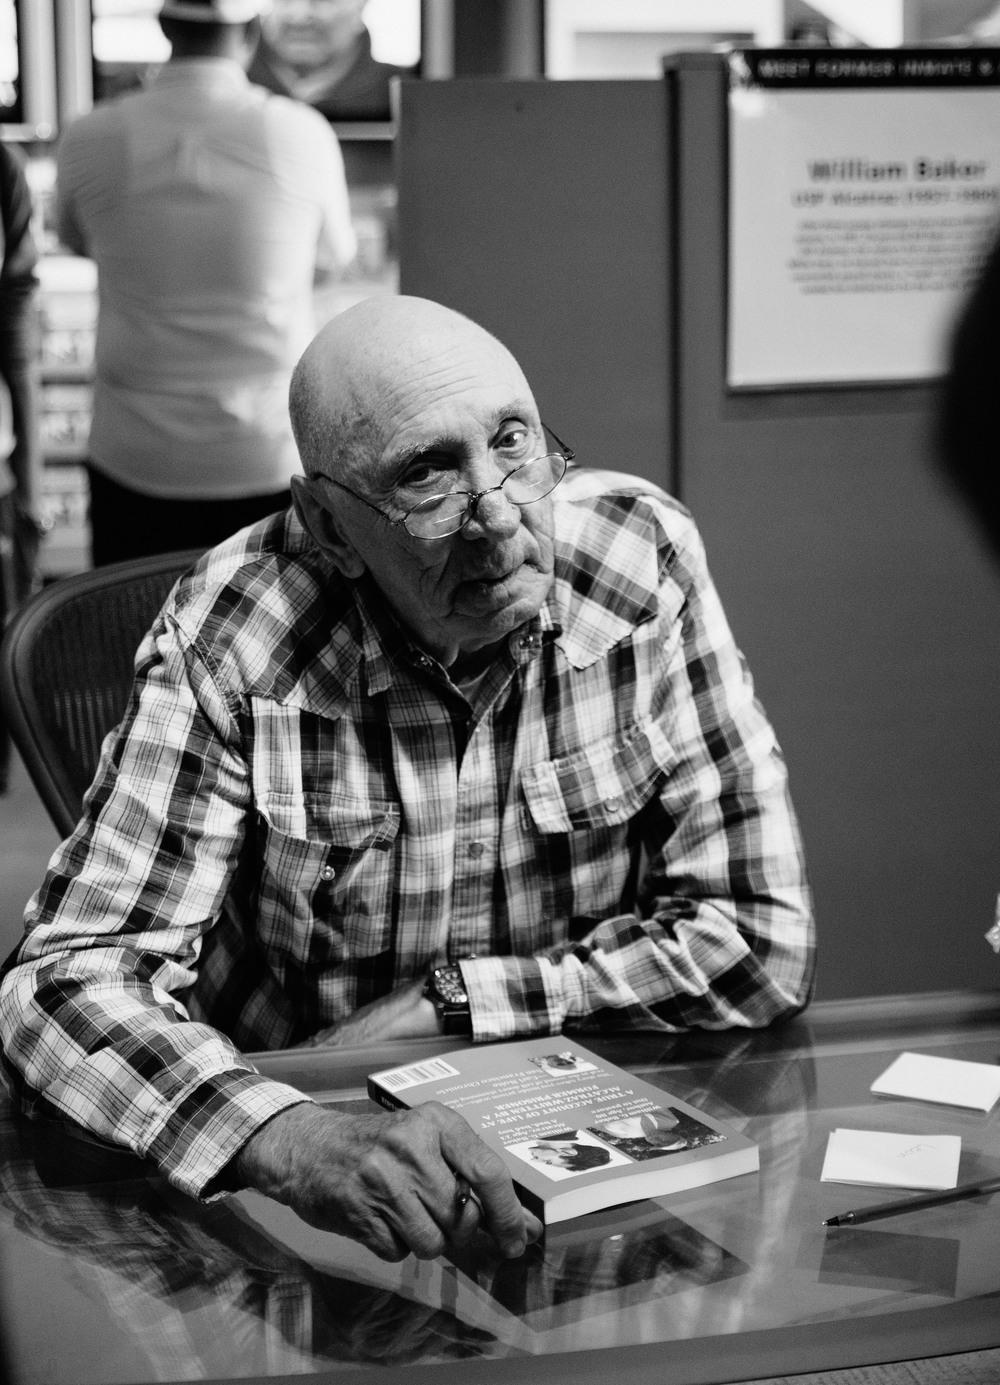 William G. Baker, former inmate at Alcatraz